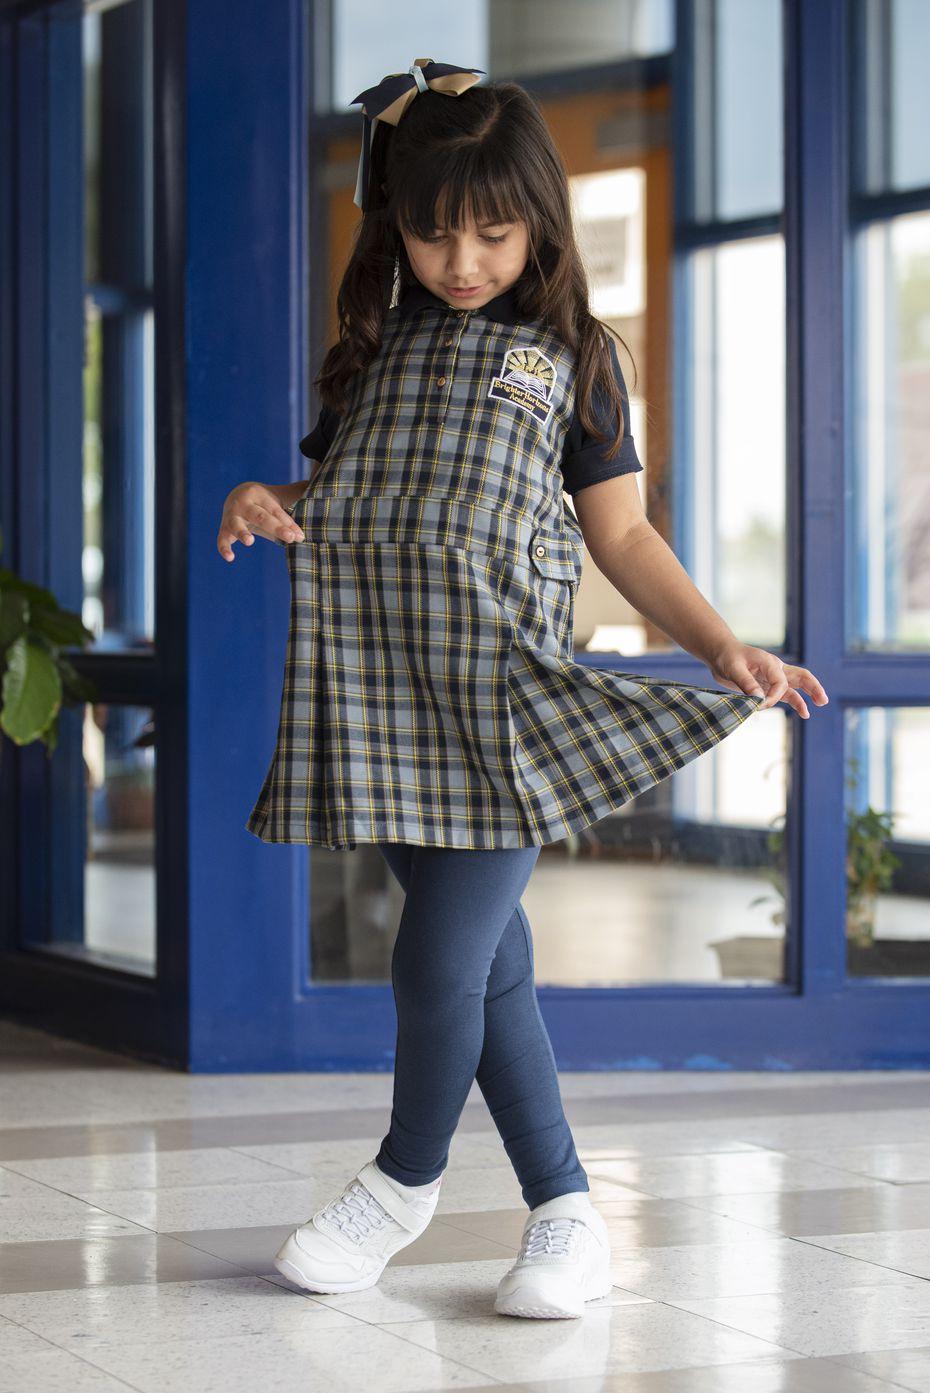 First-grader Sarah Kadiwala shows off her new school uniform at Brighter Horizons Academy in Garland.